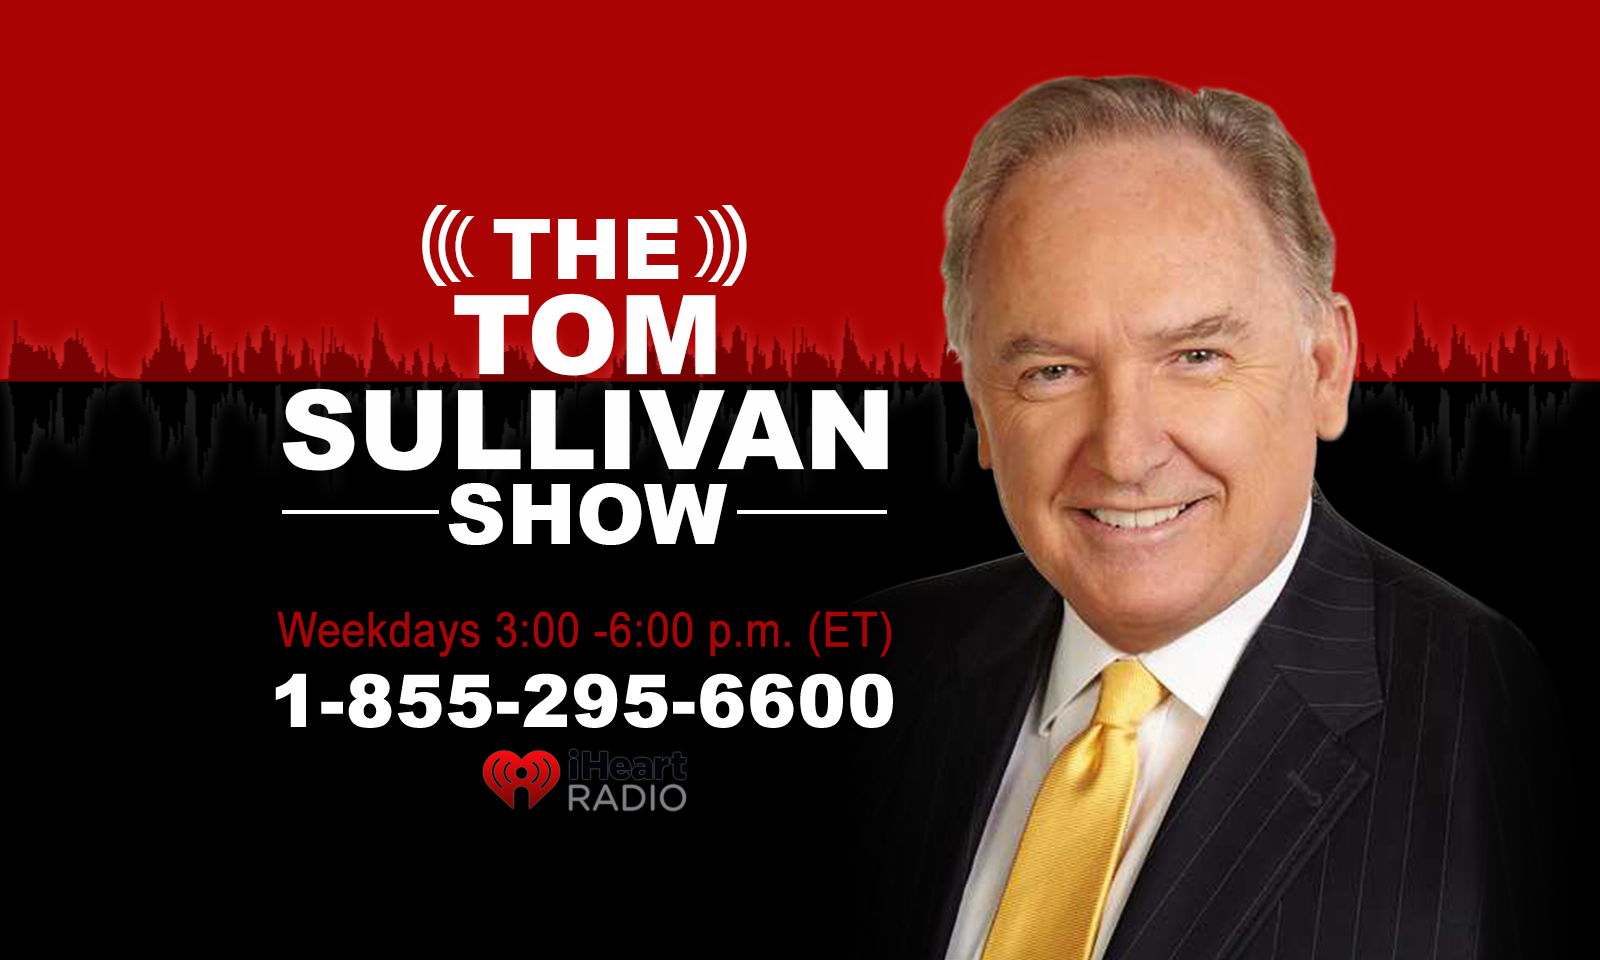 Listen to Tom Sullivan Show October 23, hour 2 | Tom Sullivan Show | Podcasts | iHeartRadio